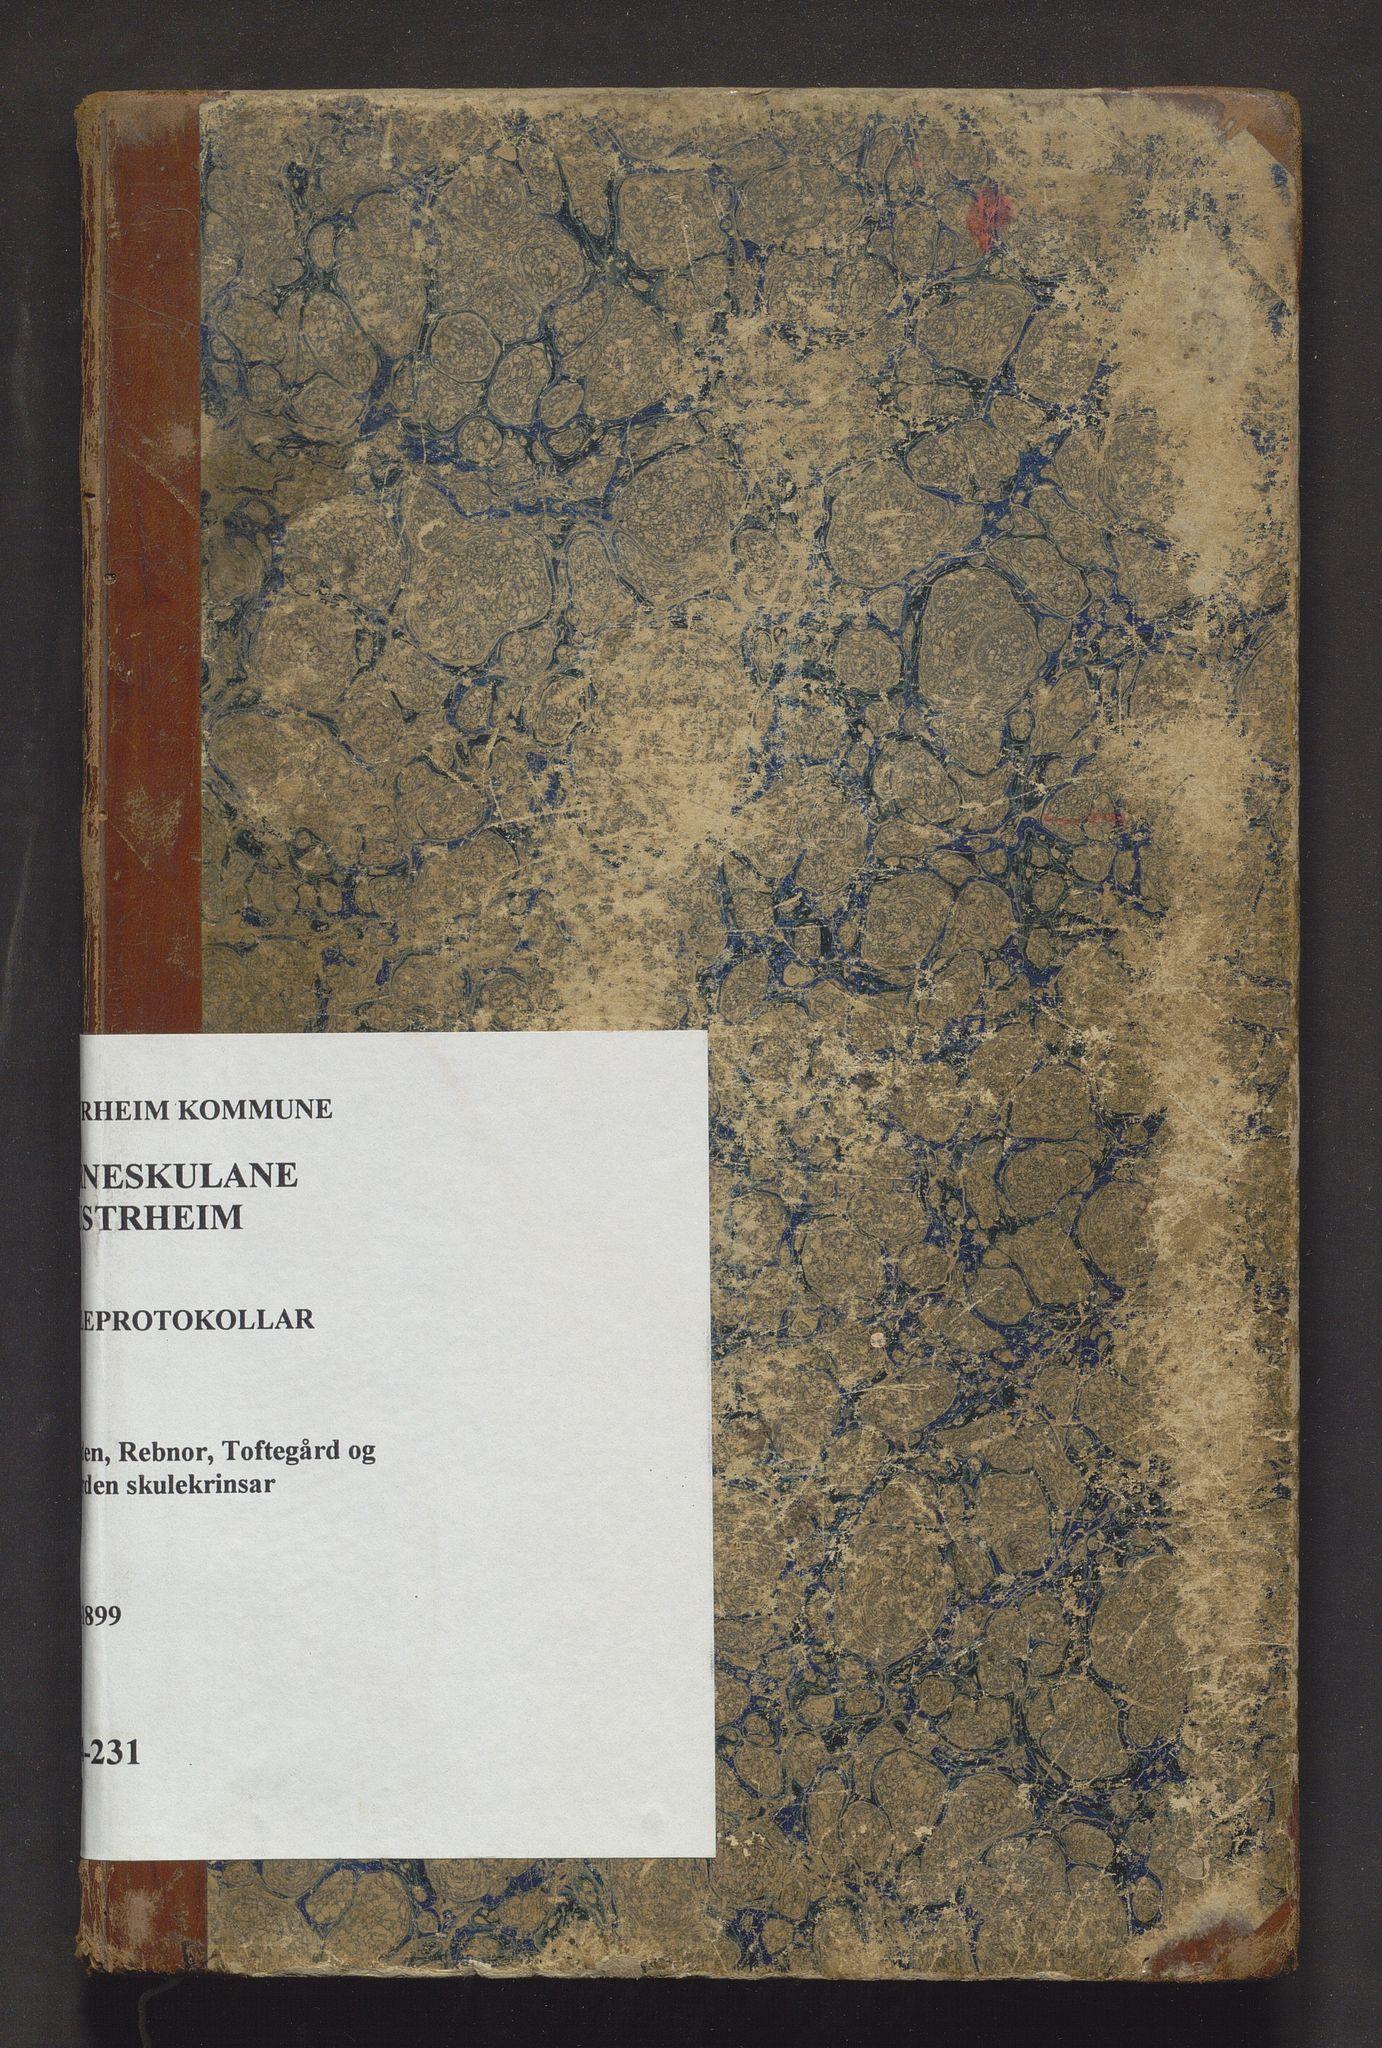 IKAH, Austrheim kommune. Barneskulane, F/Fa/L0009: Skuleprotokoll for Børilden, Rebnor, Toftegård og Øygarden, 1883-1899